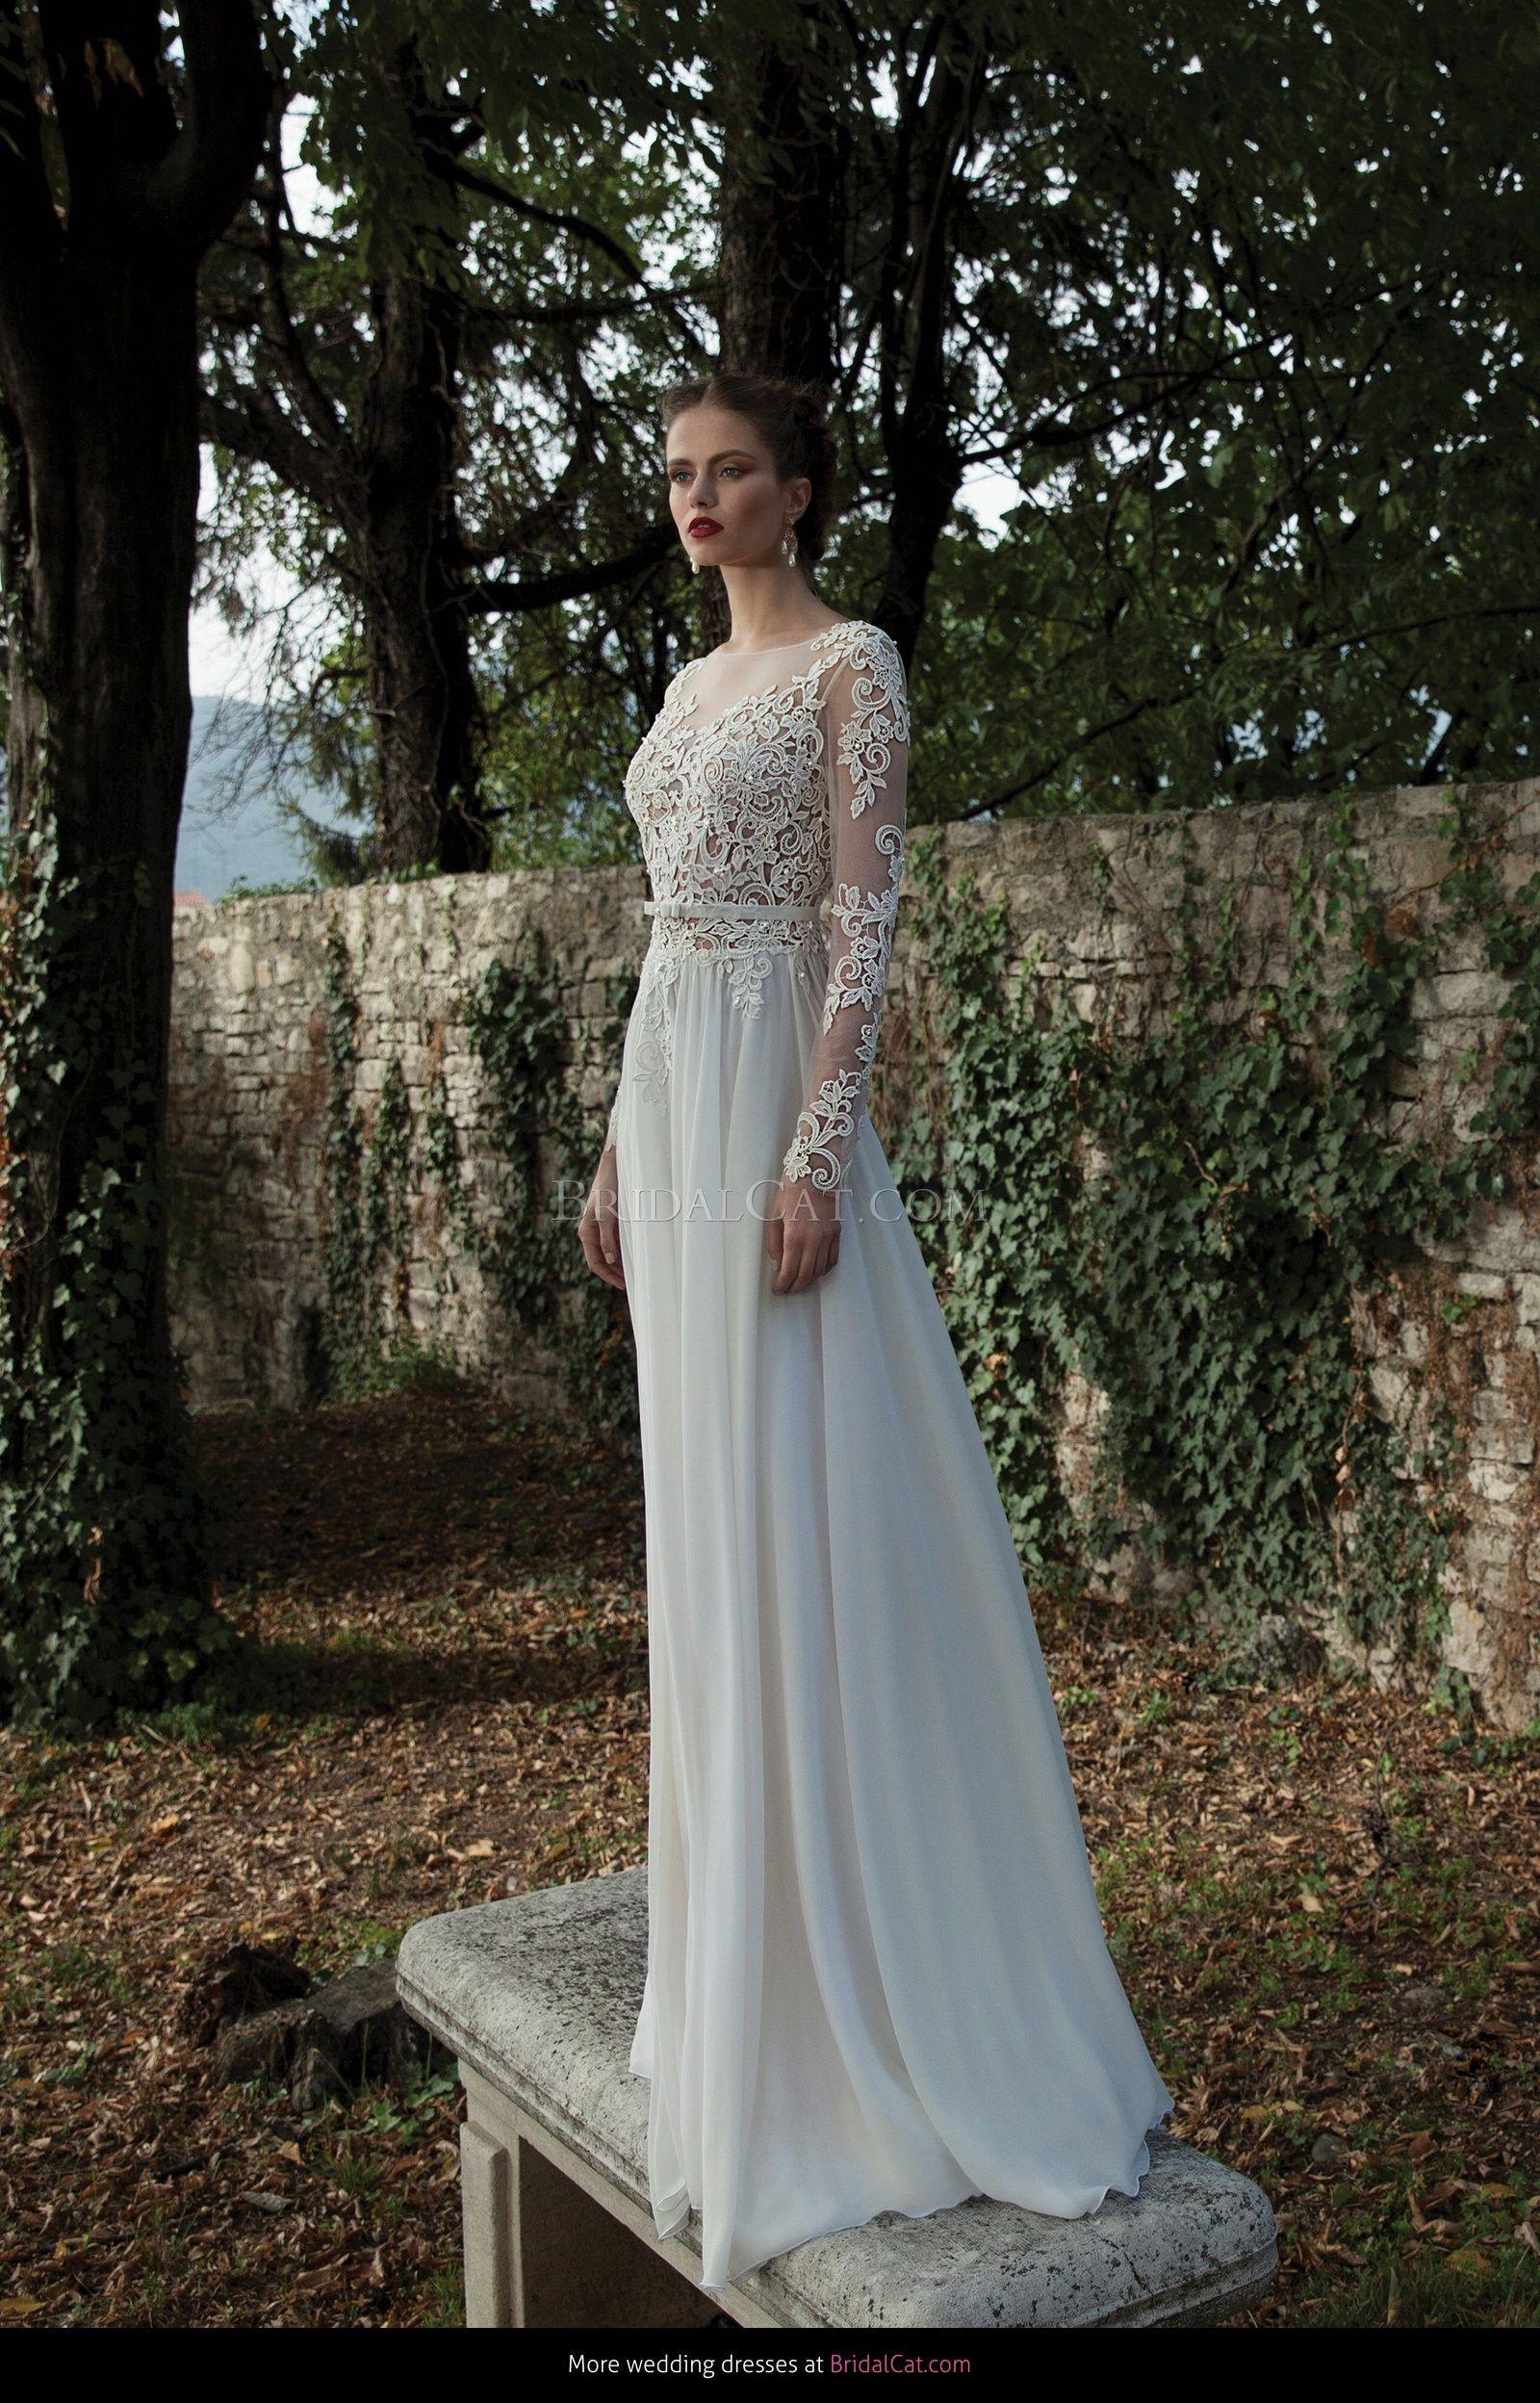 Berta bridal google search casamento pinterest berta bridal